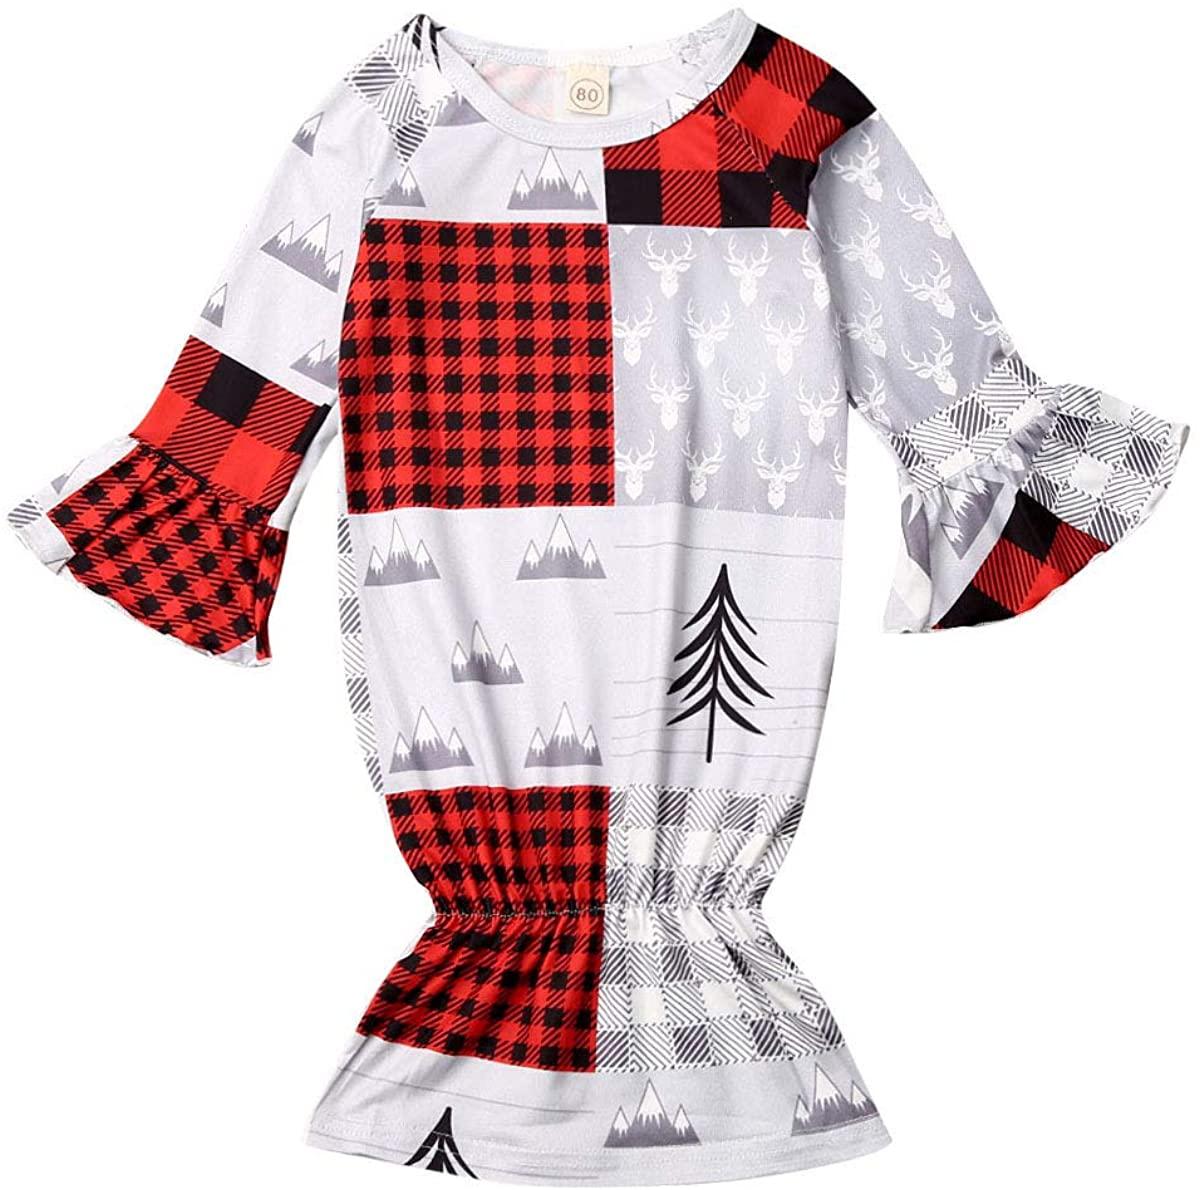 Kosusanill Newborn Baby Girl Boy Nightgown My First Christmas Sleep Bag Cotton Sleeper Outfit